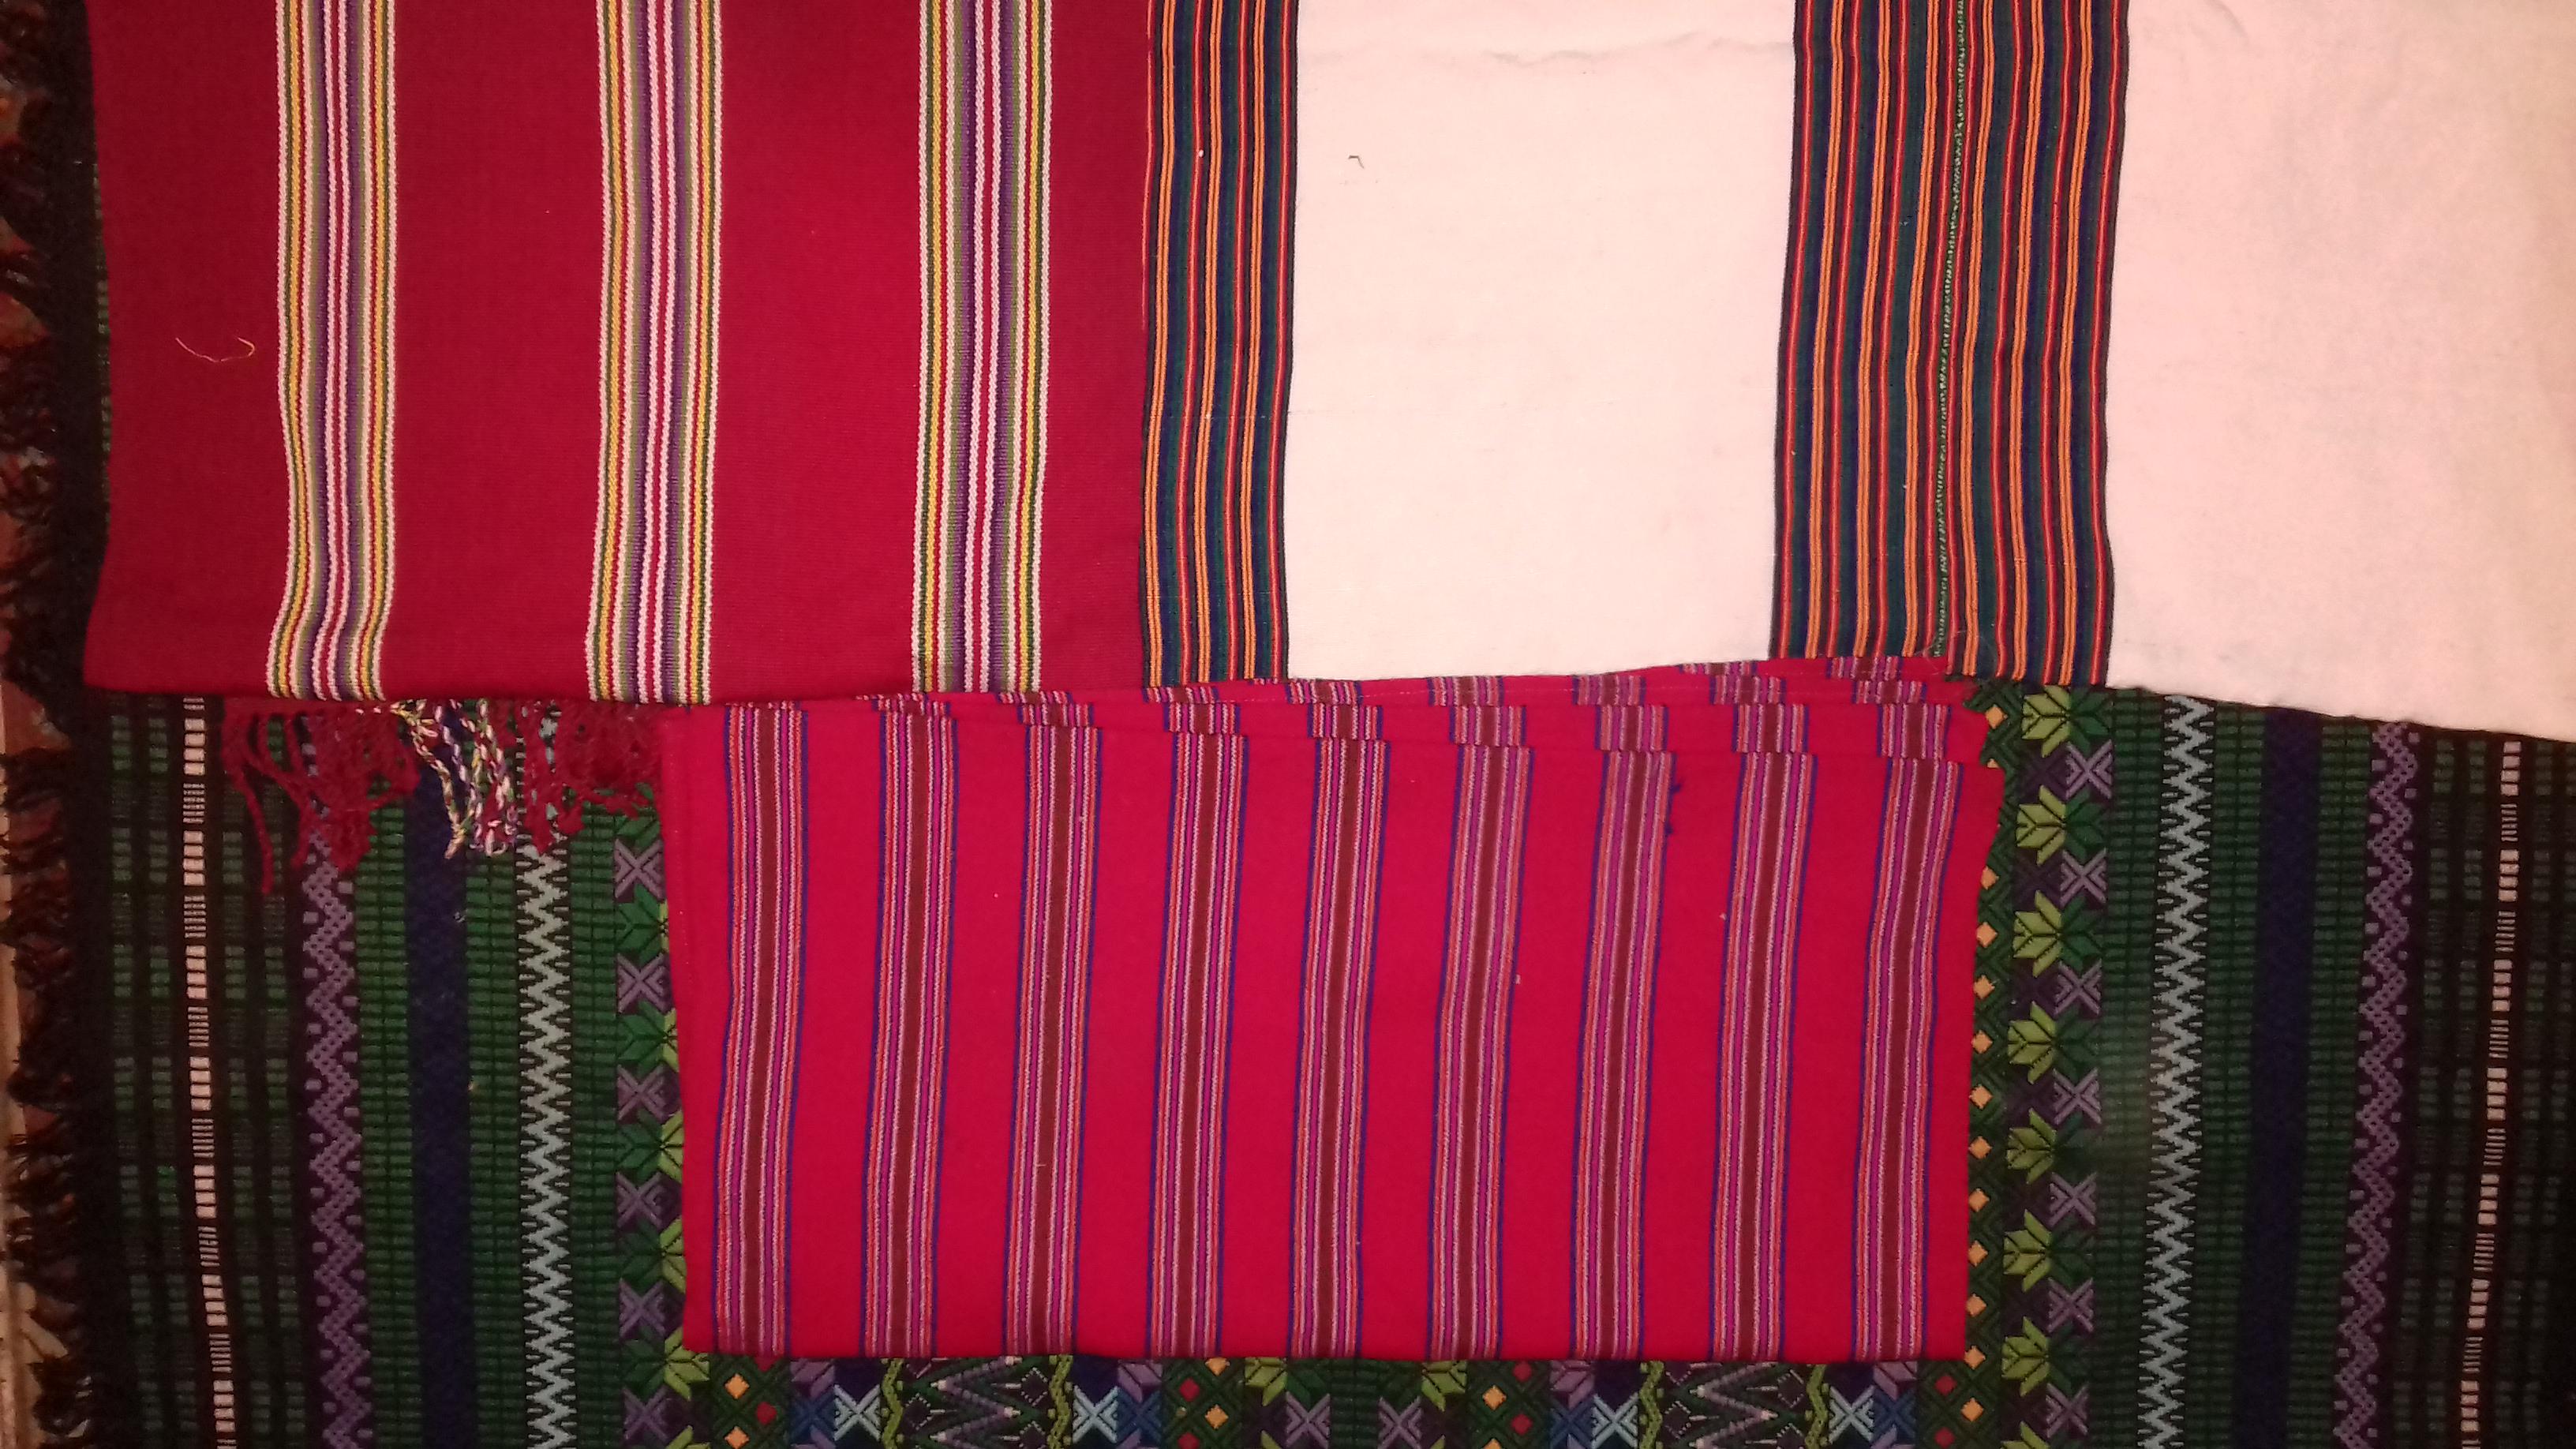 Weavings given to me by friends from San Marcos La Laguna, San Juan La Laguna, Panajachel and Santa Clara.